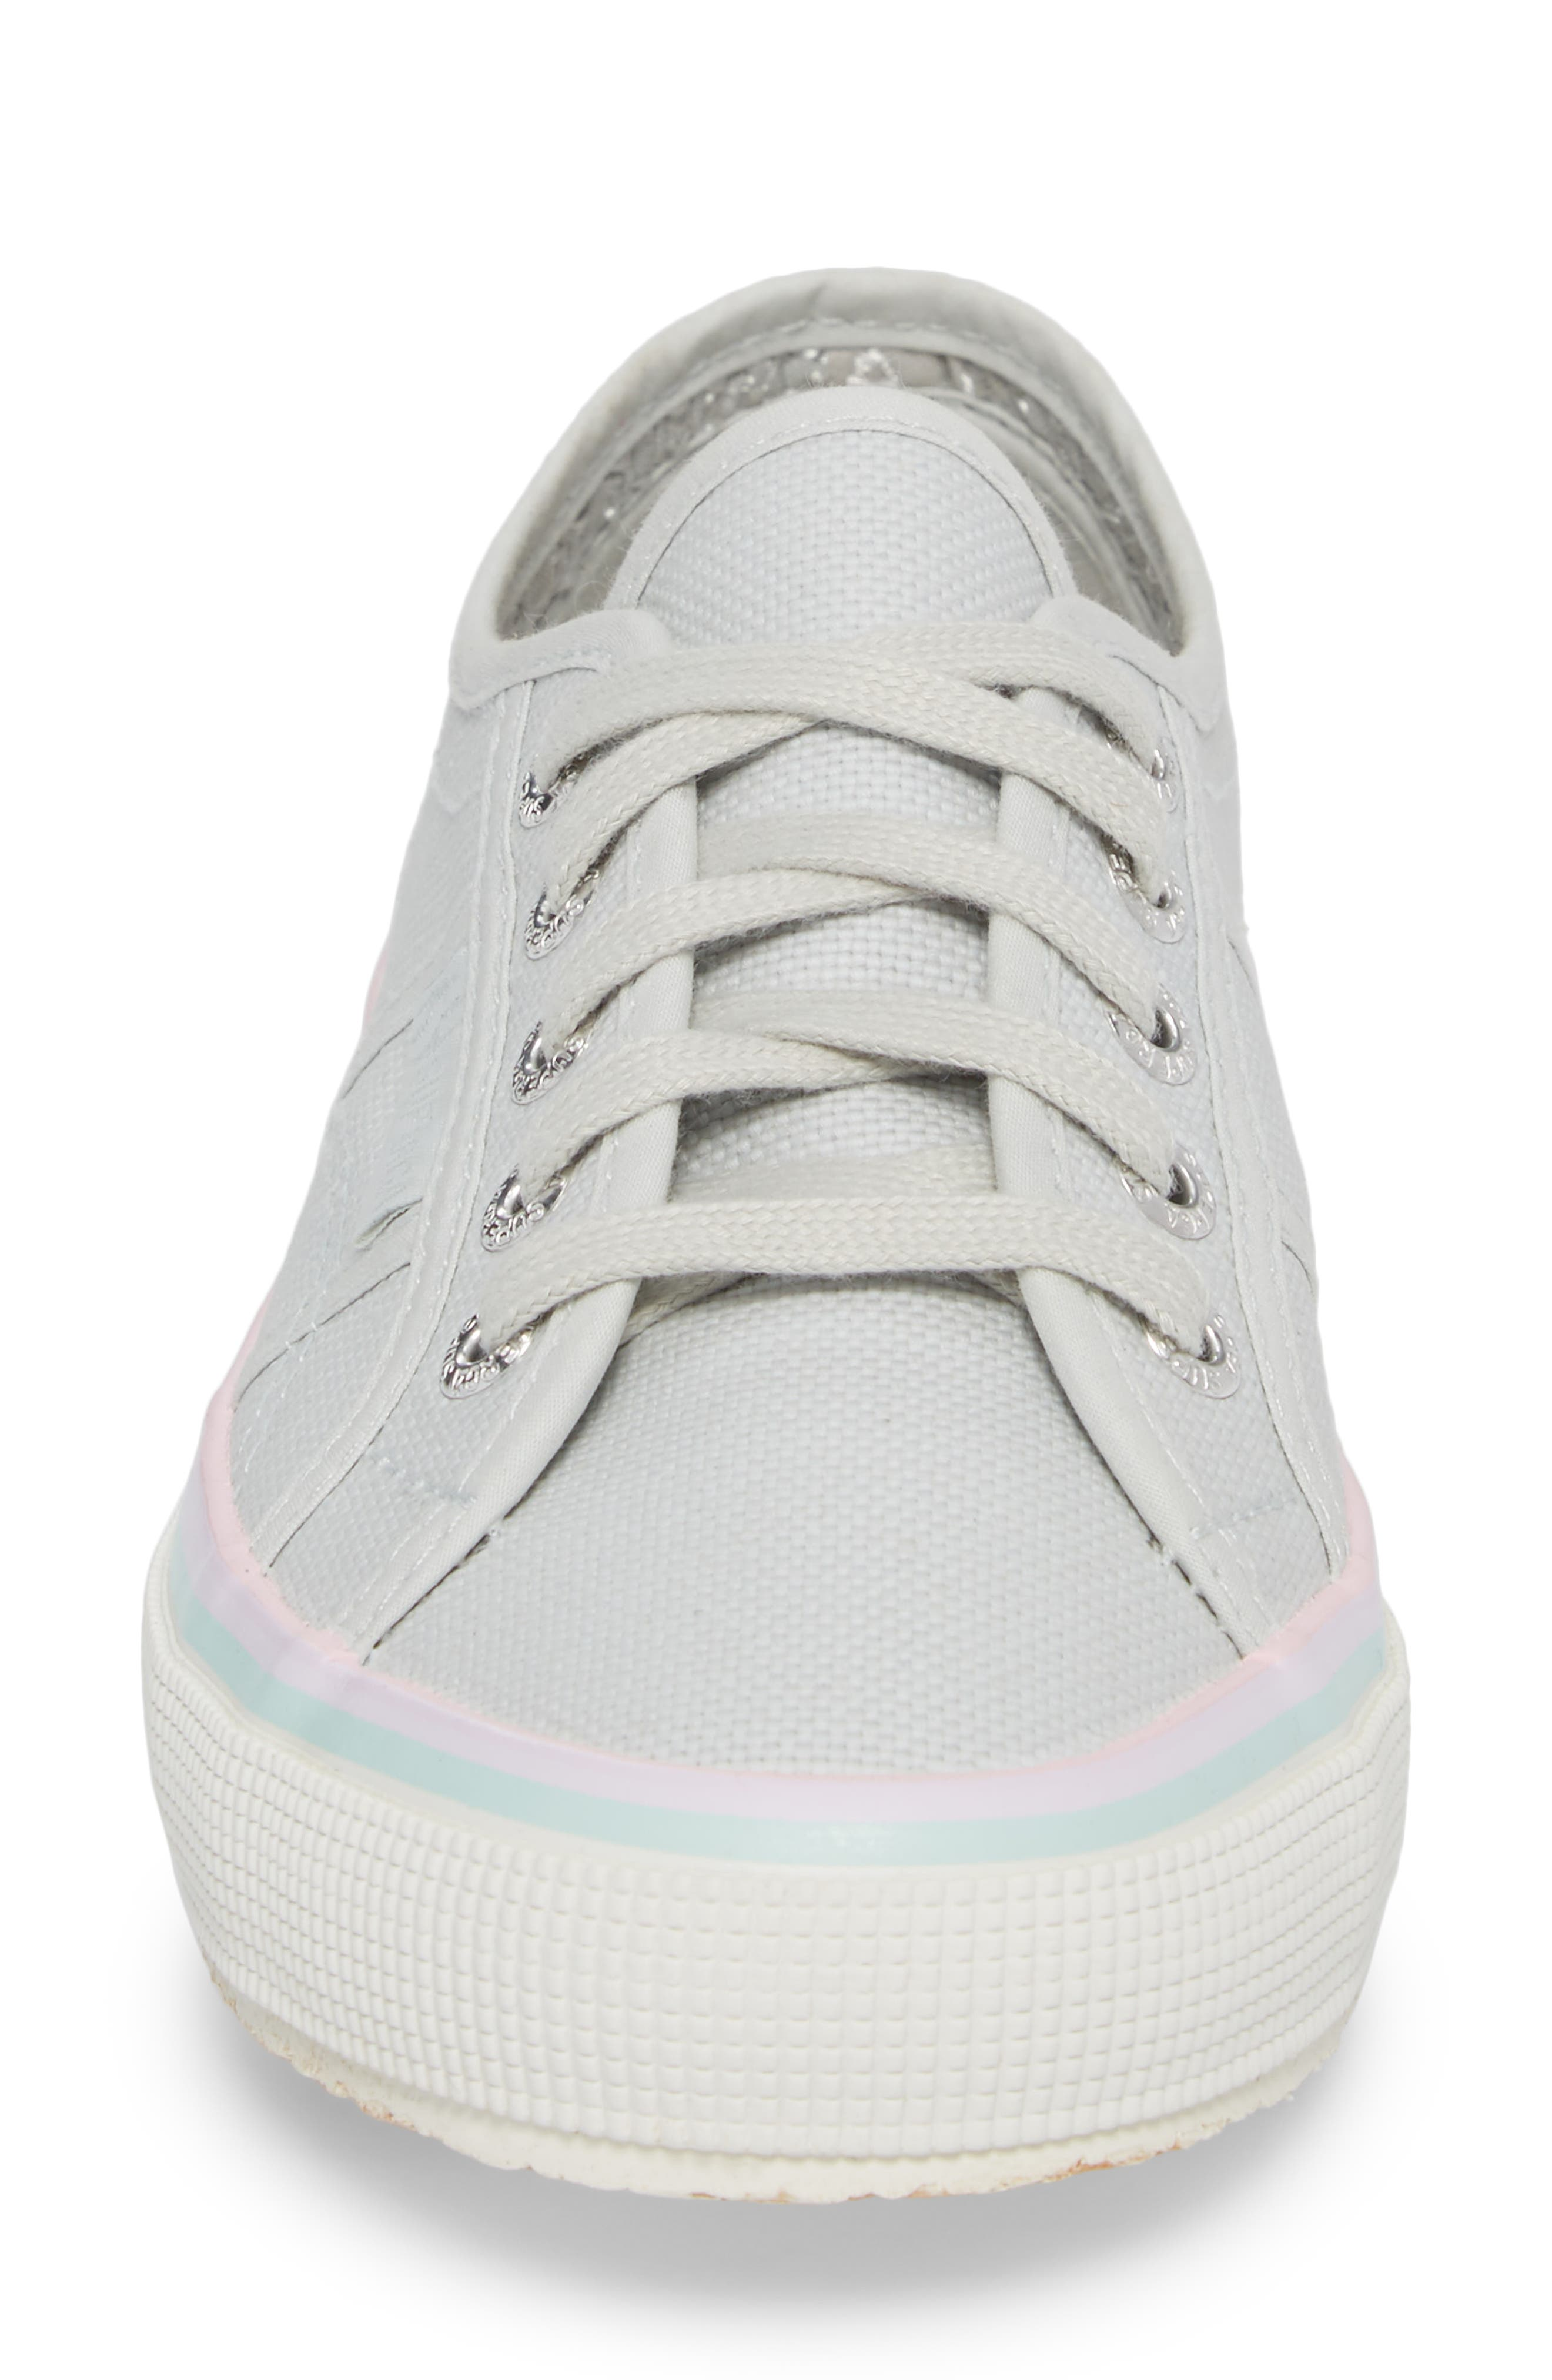 2750 Three-Stripe Sneaker,                             Alternate thumbnail 4, color,                             020